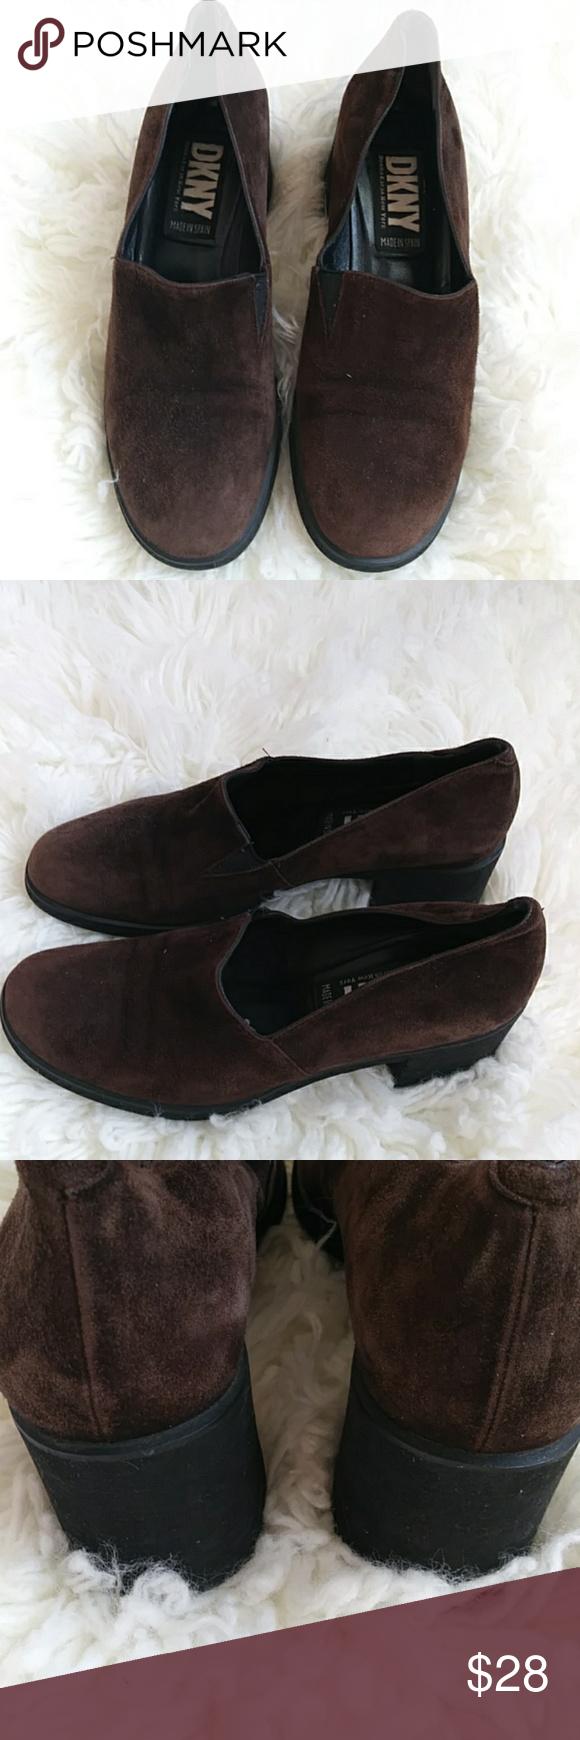 DKNY suede shoes Dark brown suede